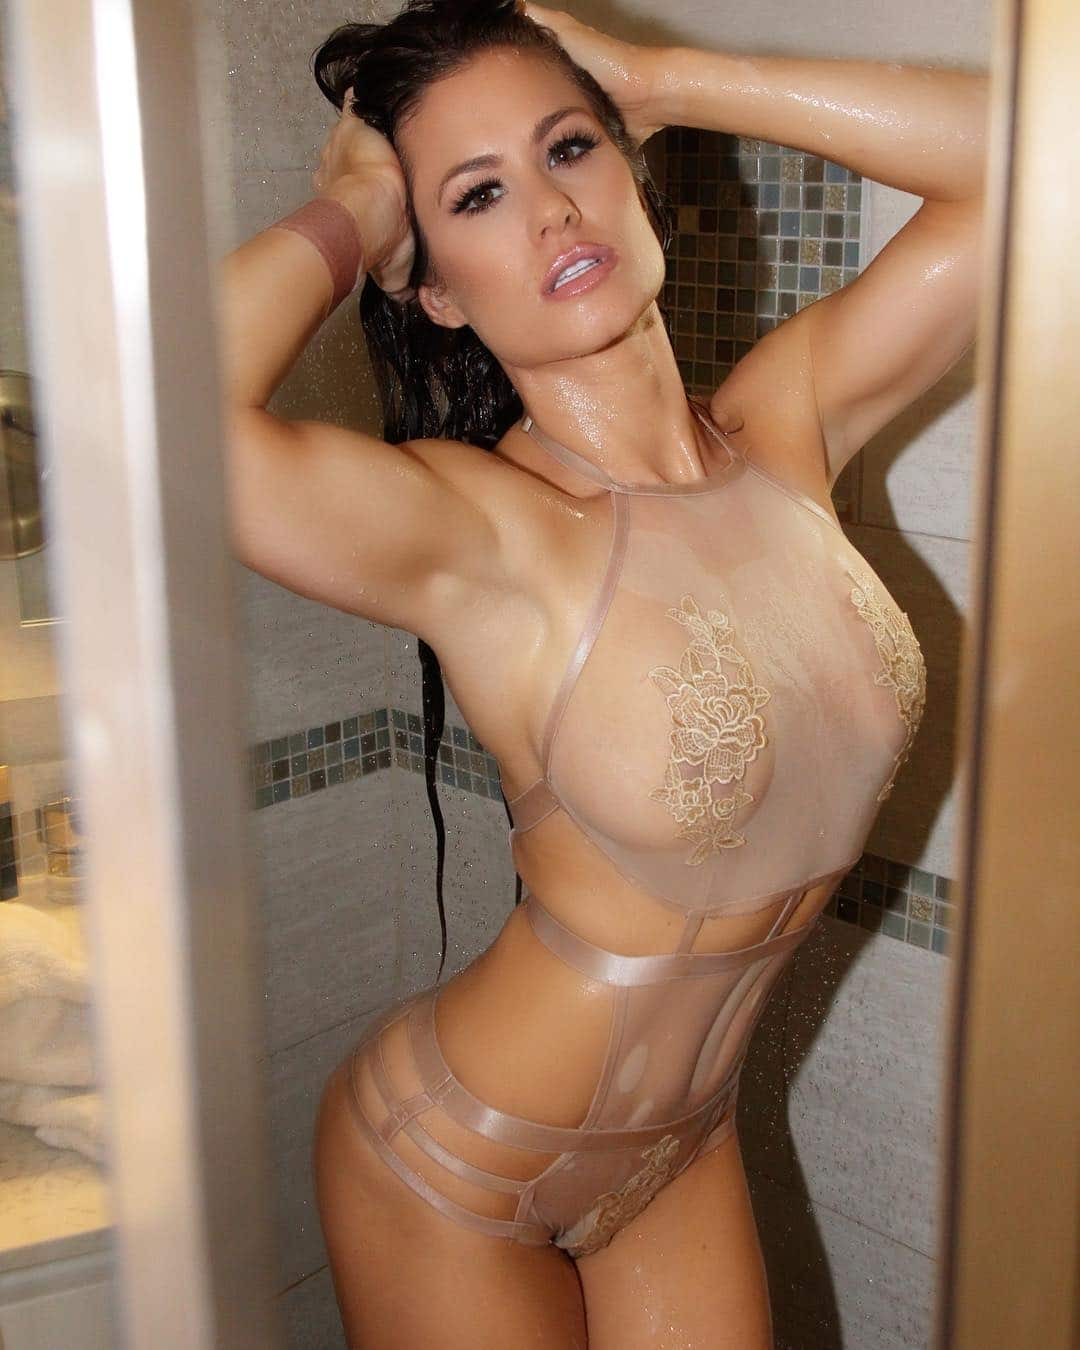 Wwe brooke nude